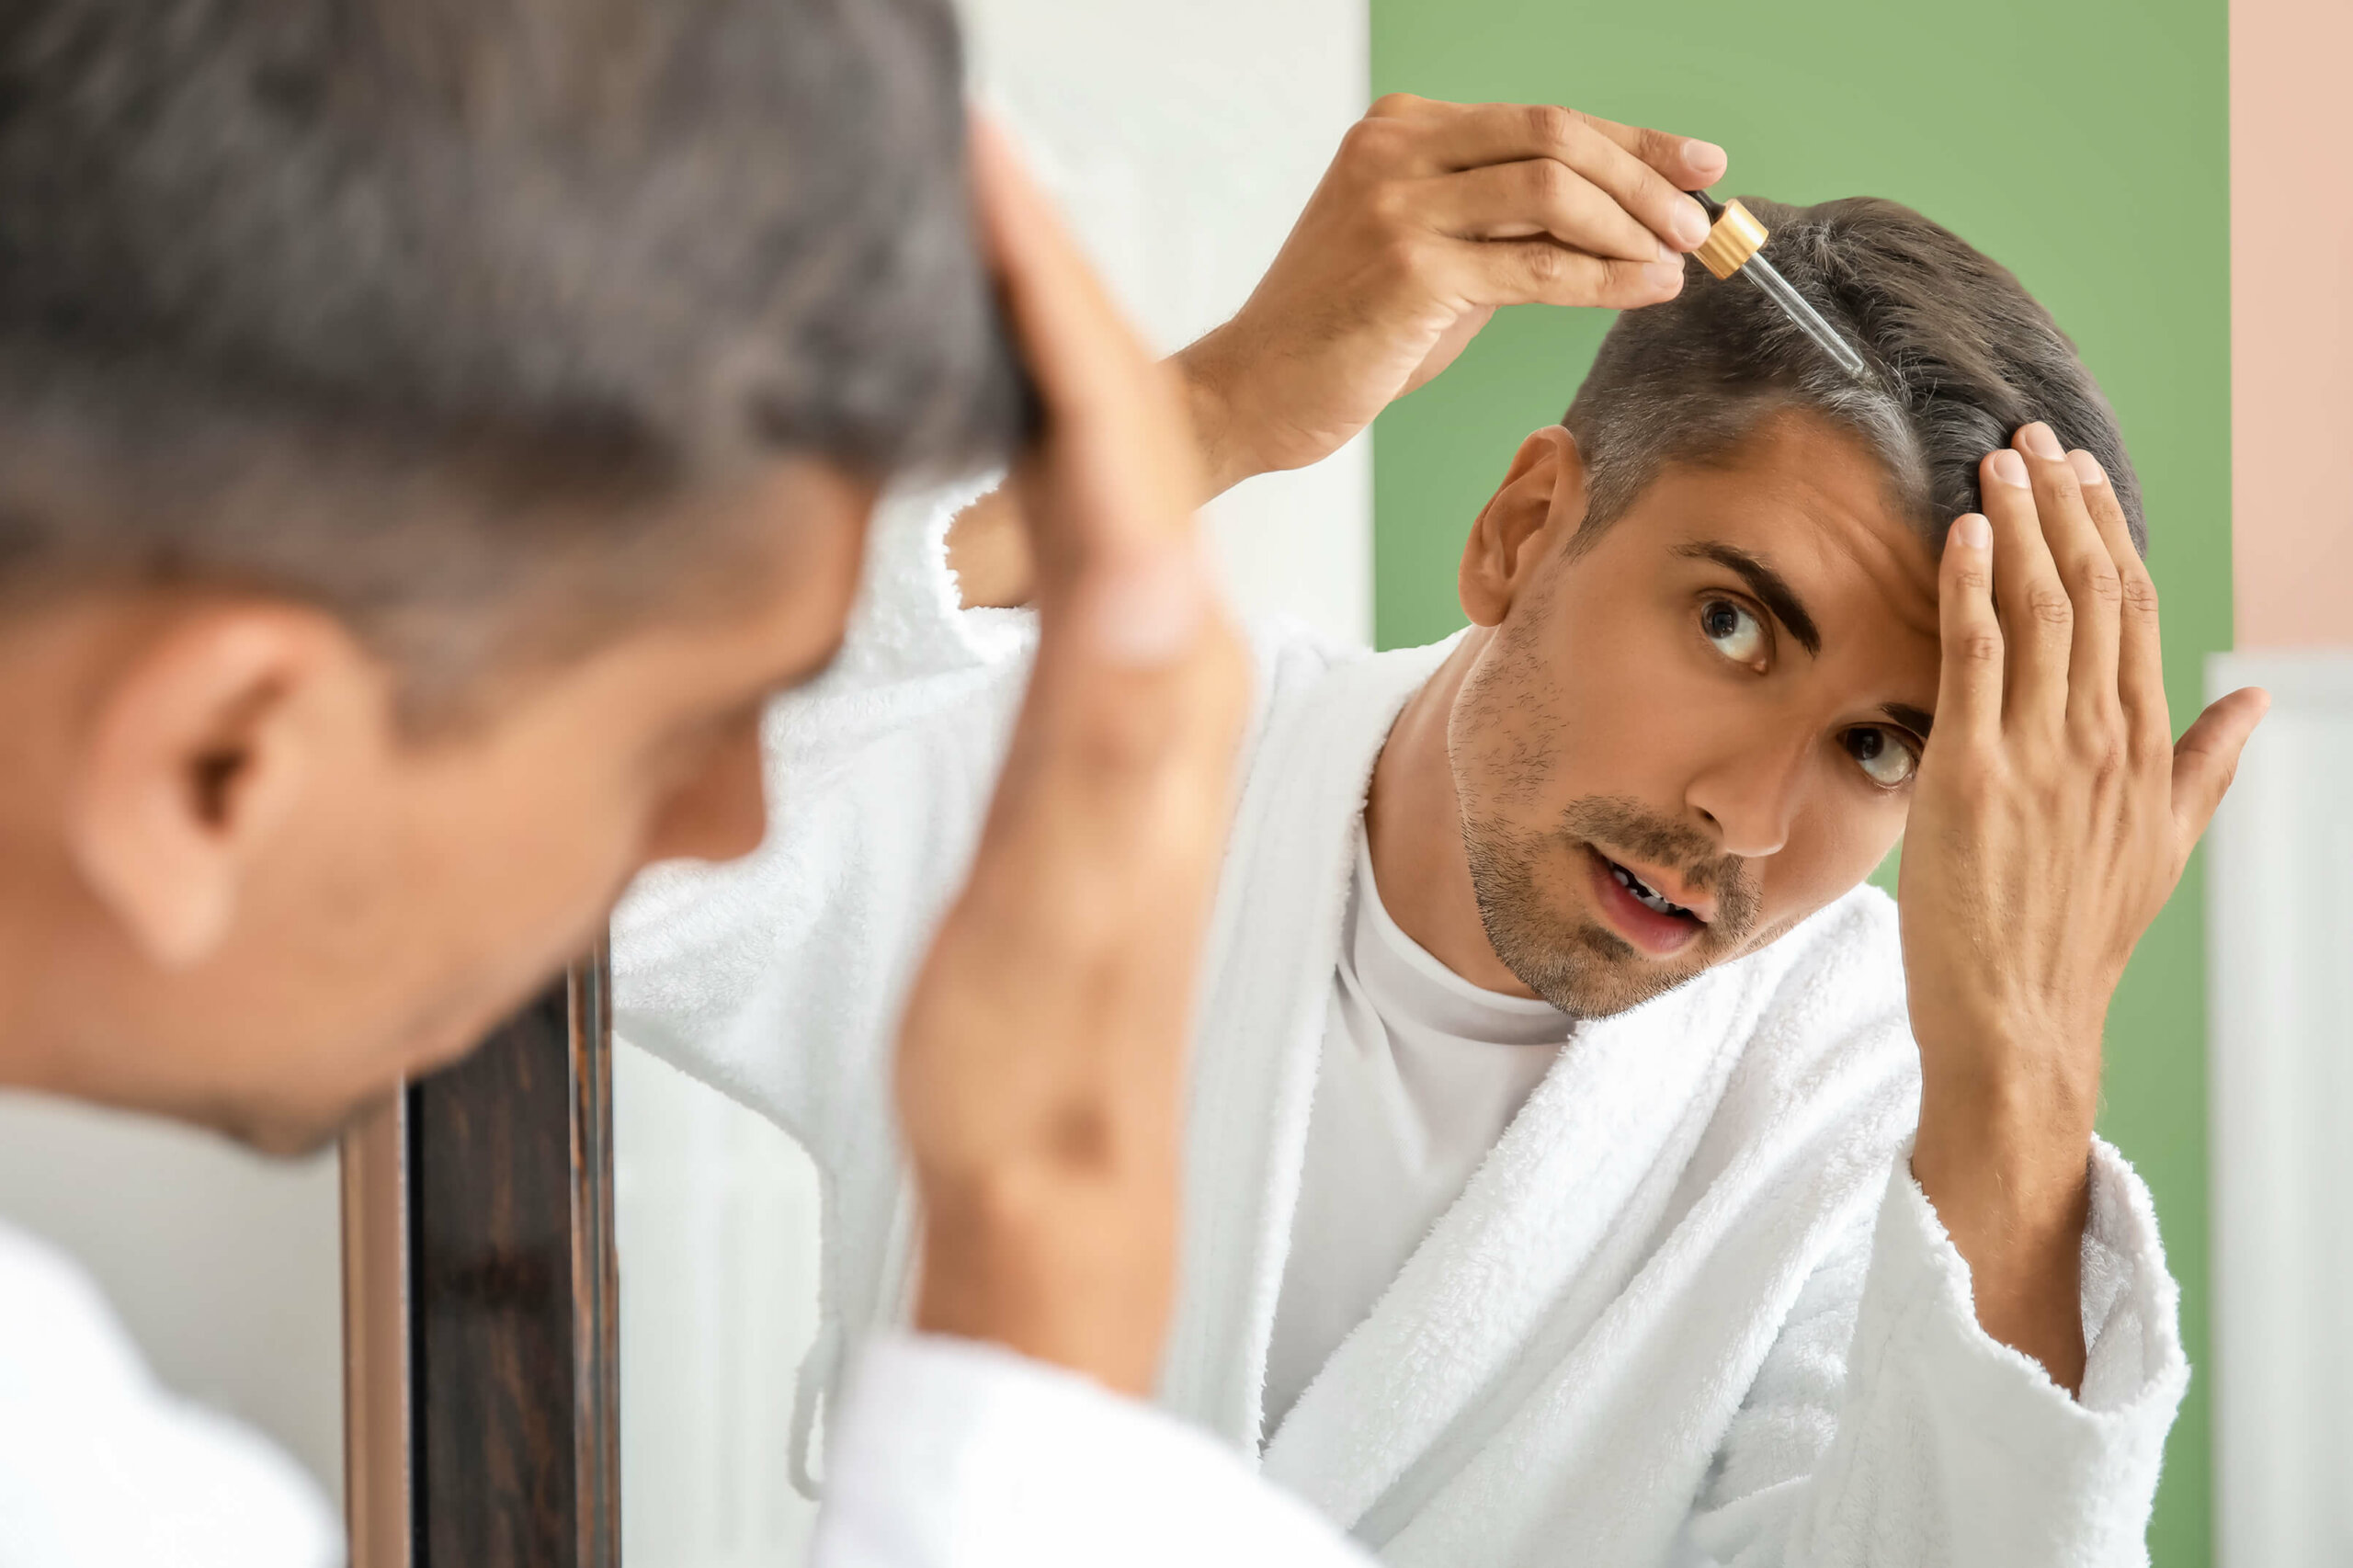 A man in a bathrobe applying liquid minoxidil to his scalp with a dropper